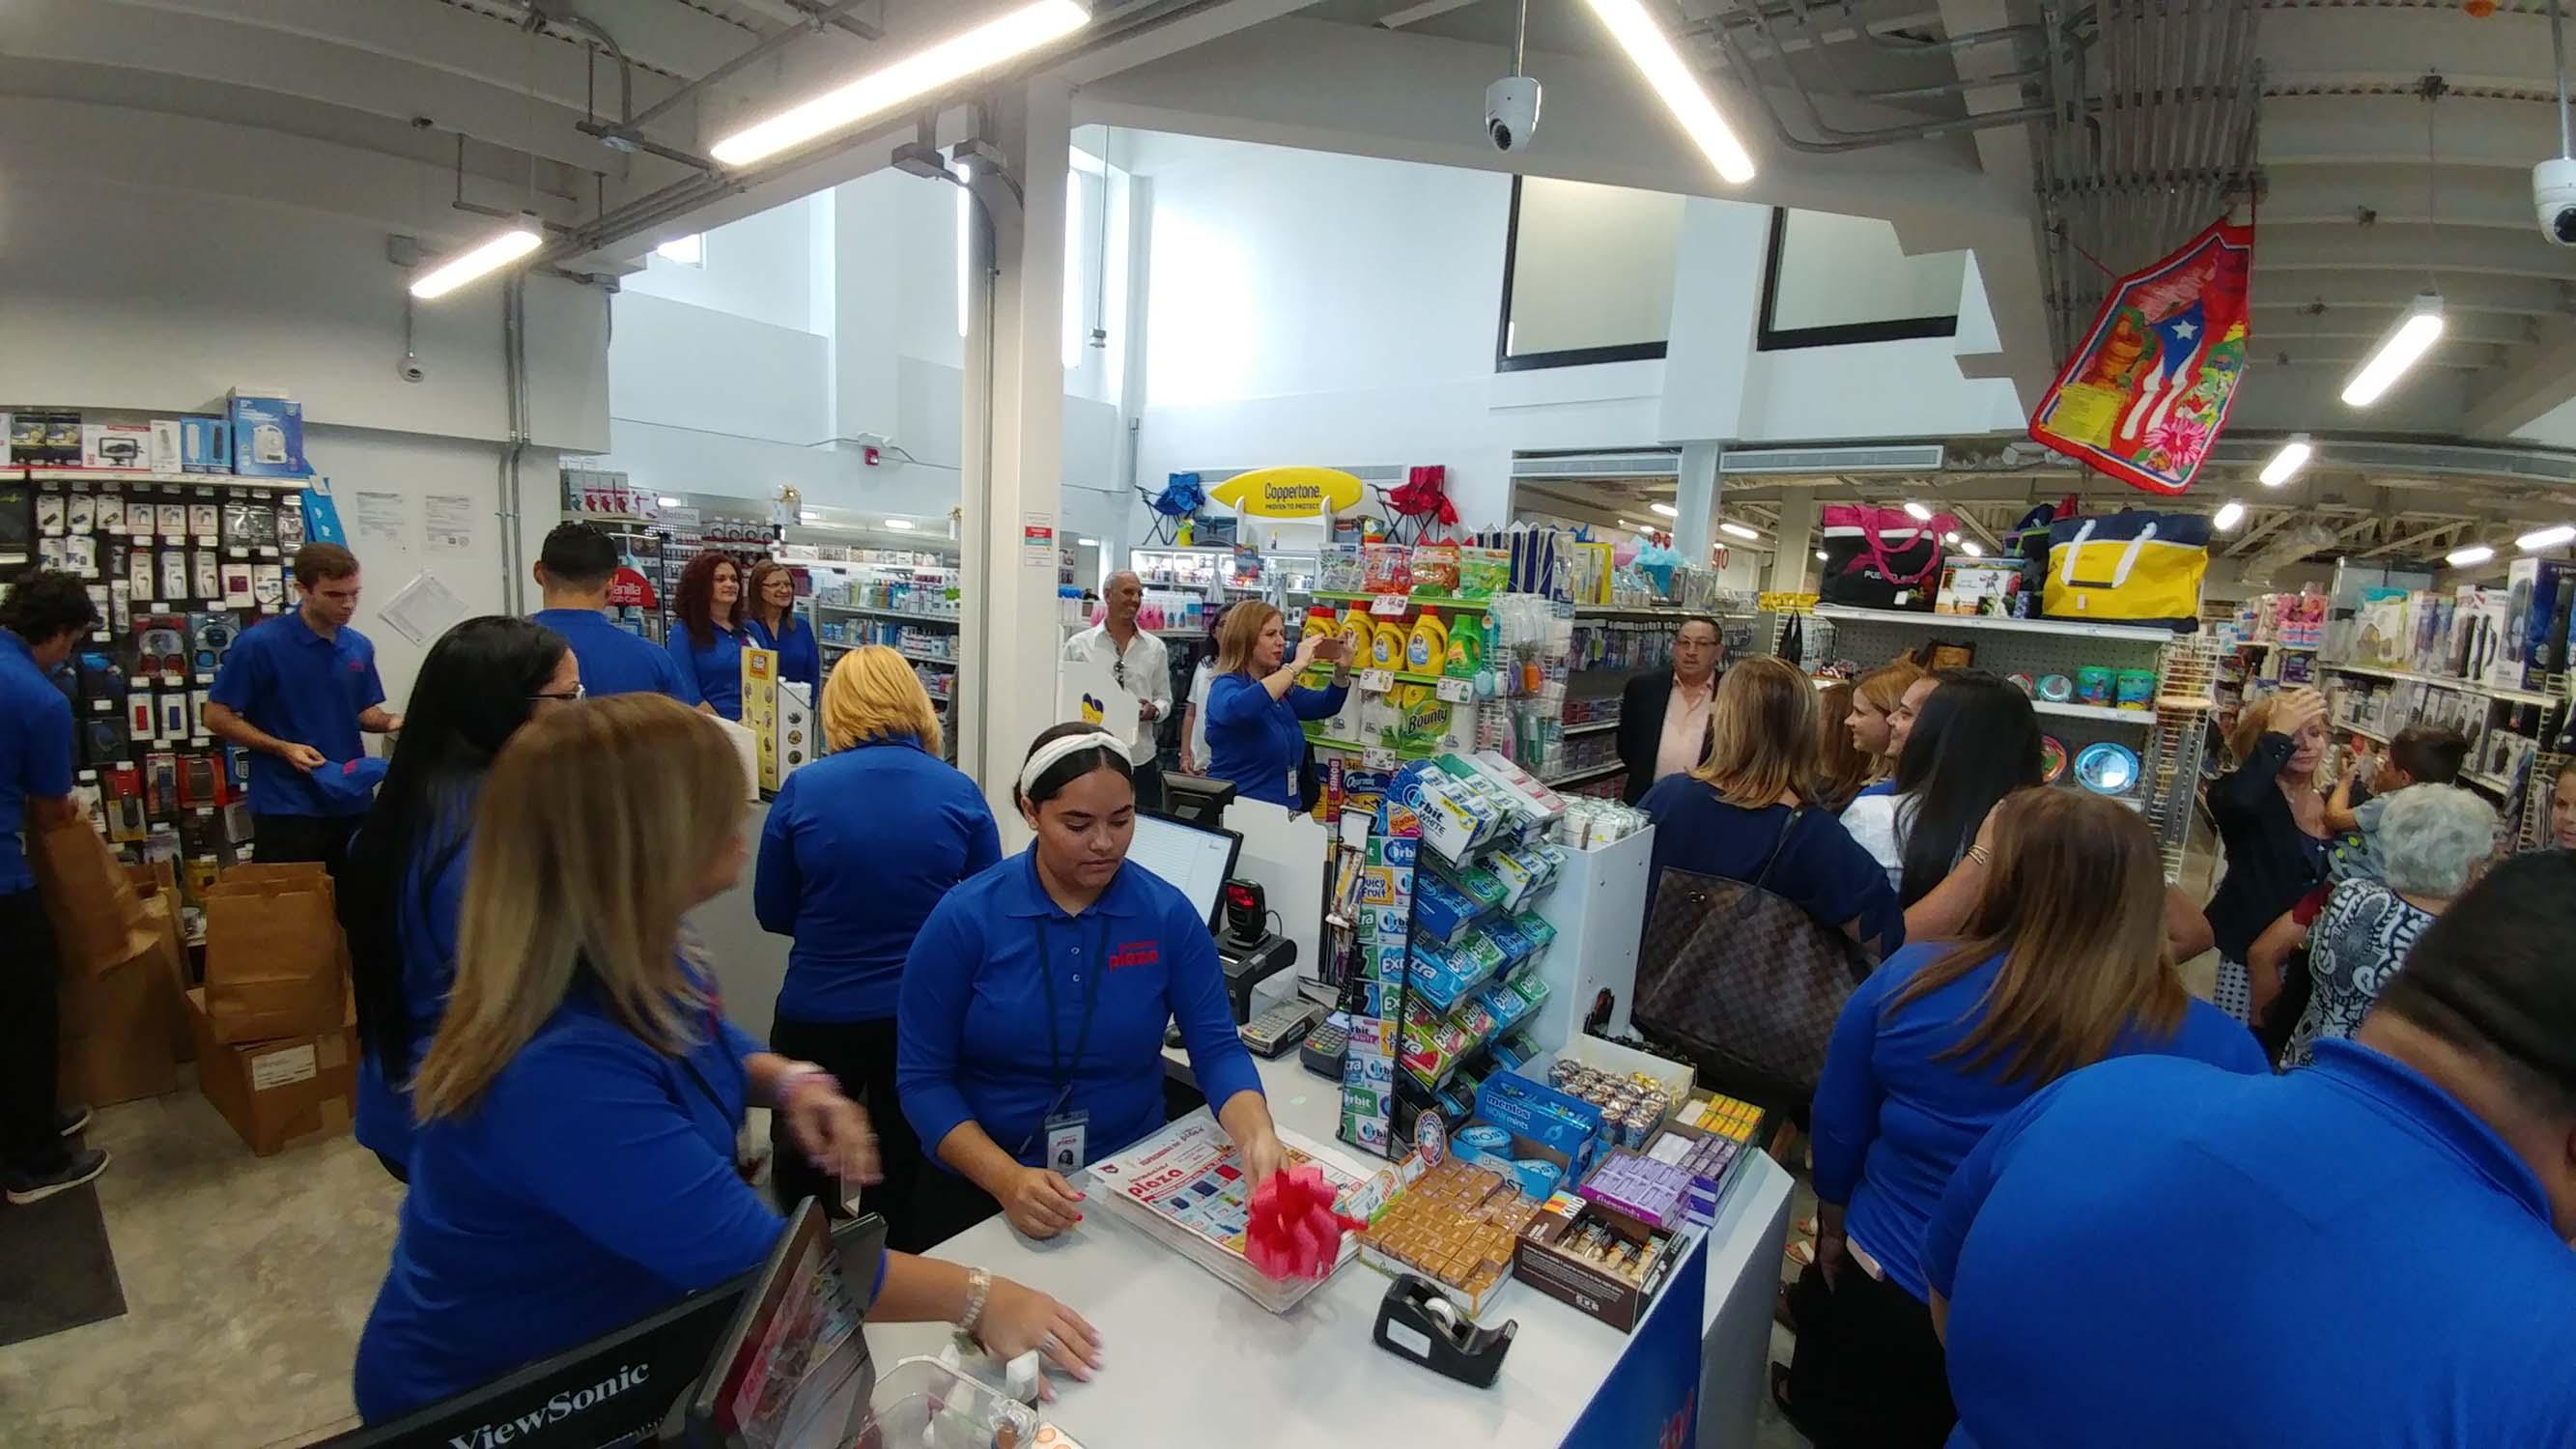 Inauguracion_Farmacias_Plaza-Plaza_del_Sol-37.jpg